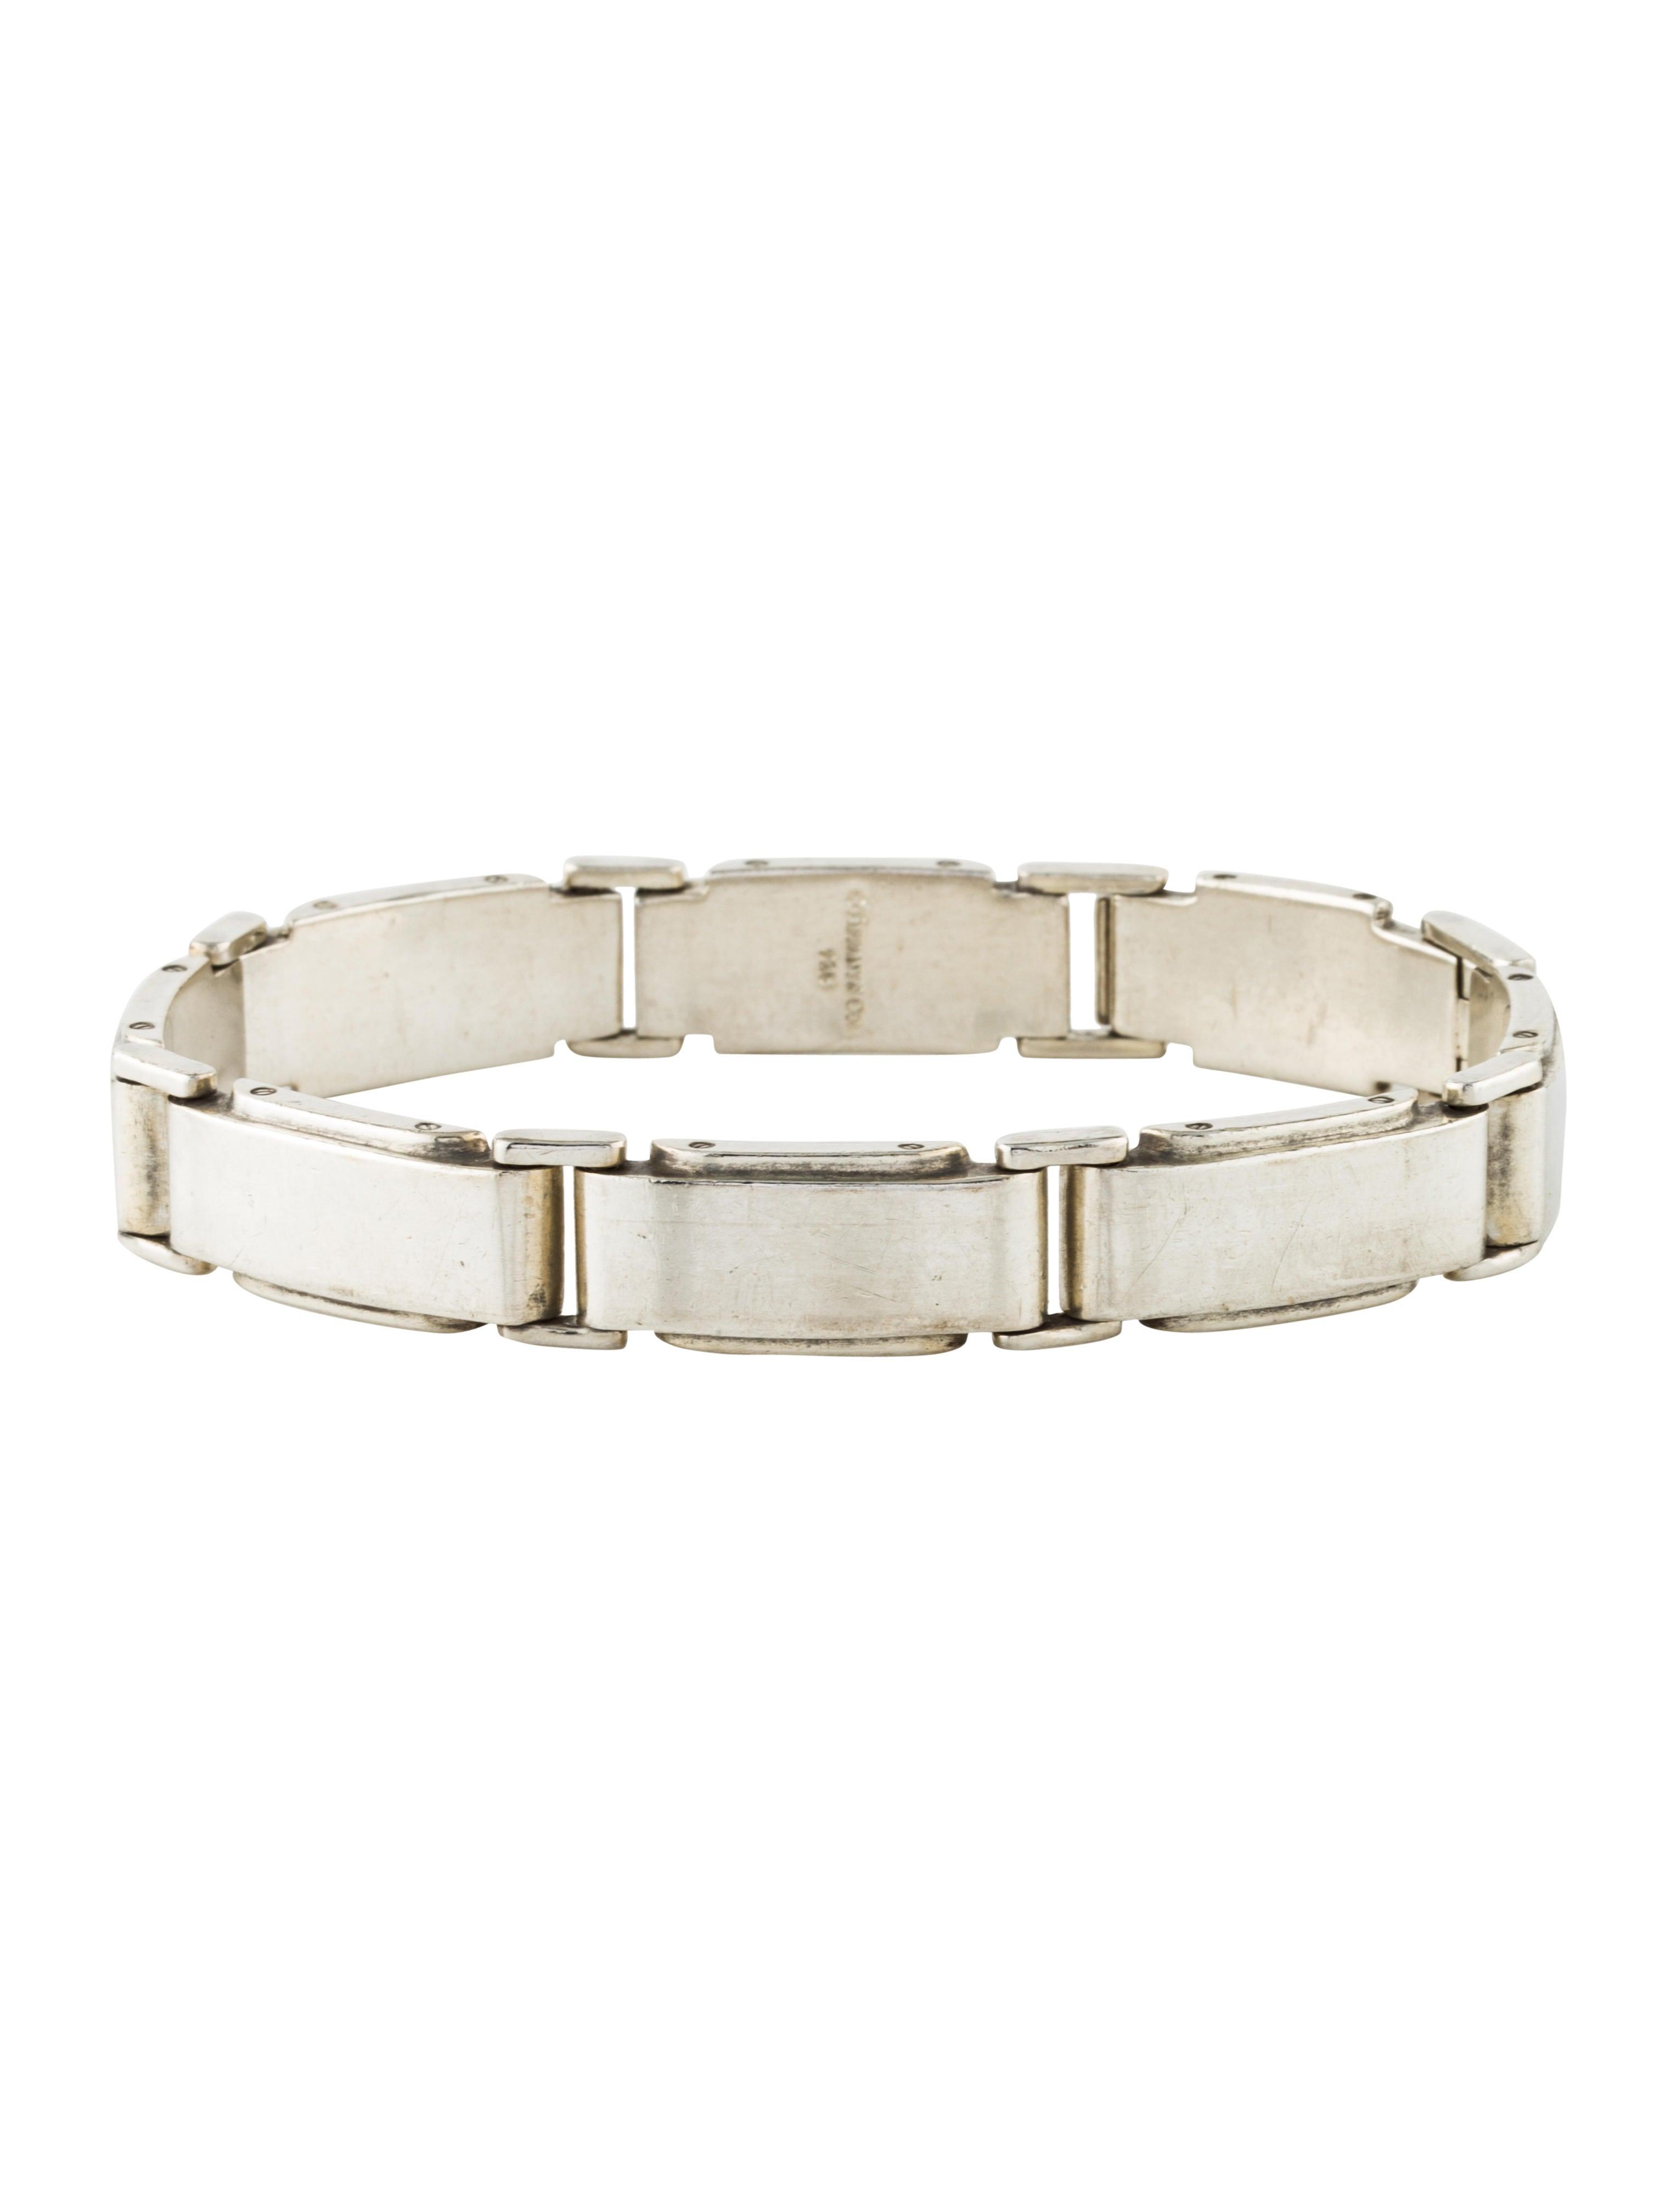 7b33e7f3a Tiffany & Co. Metropolis Link Bracelet - Bracelets - TIF74369   The ...